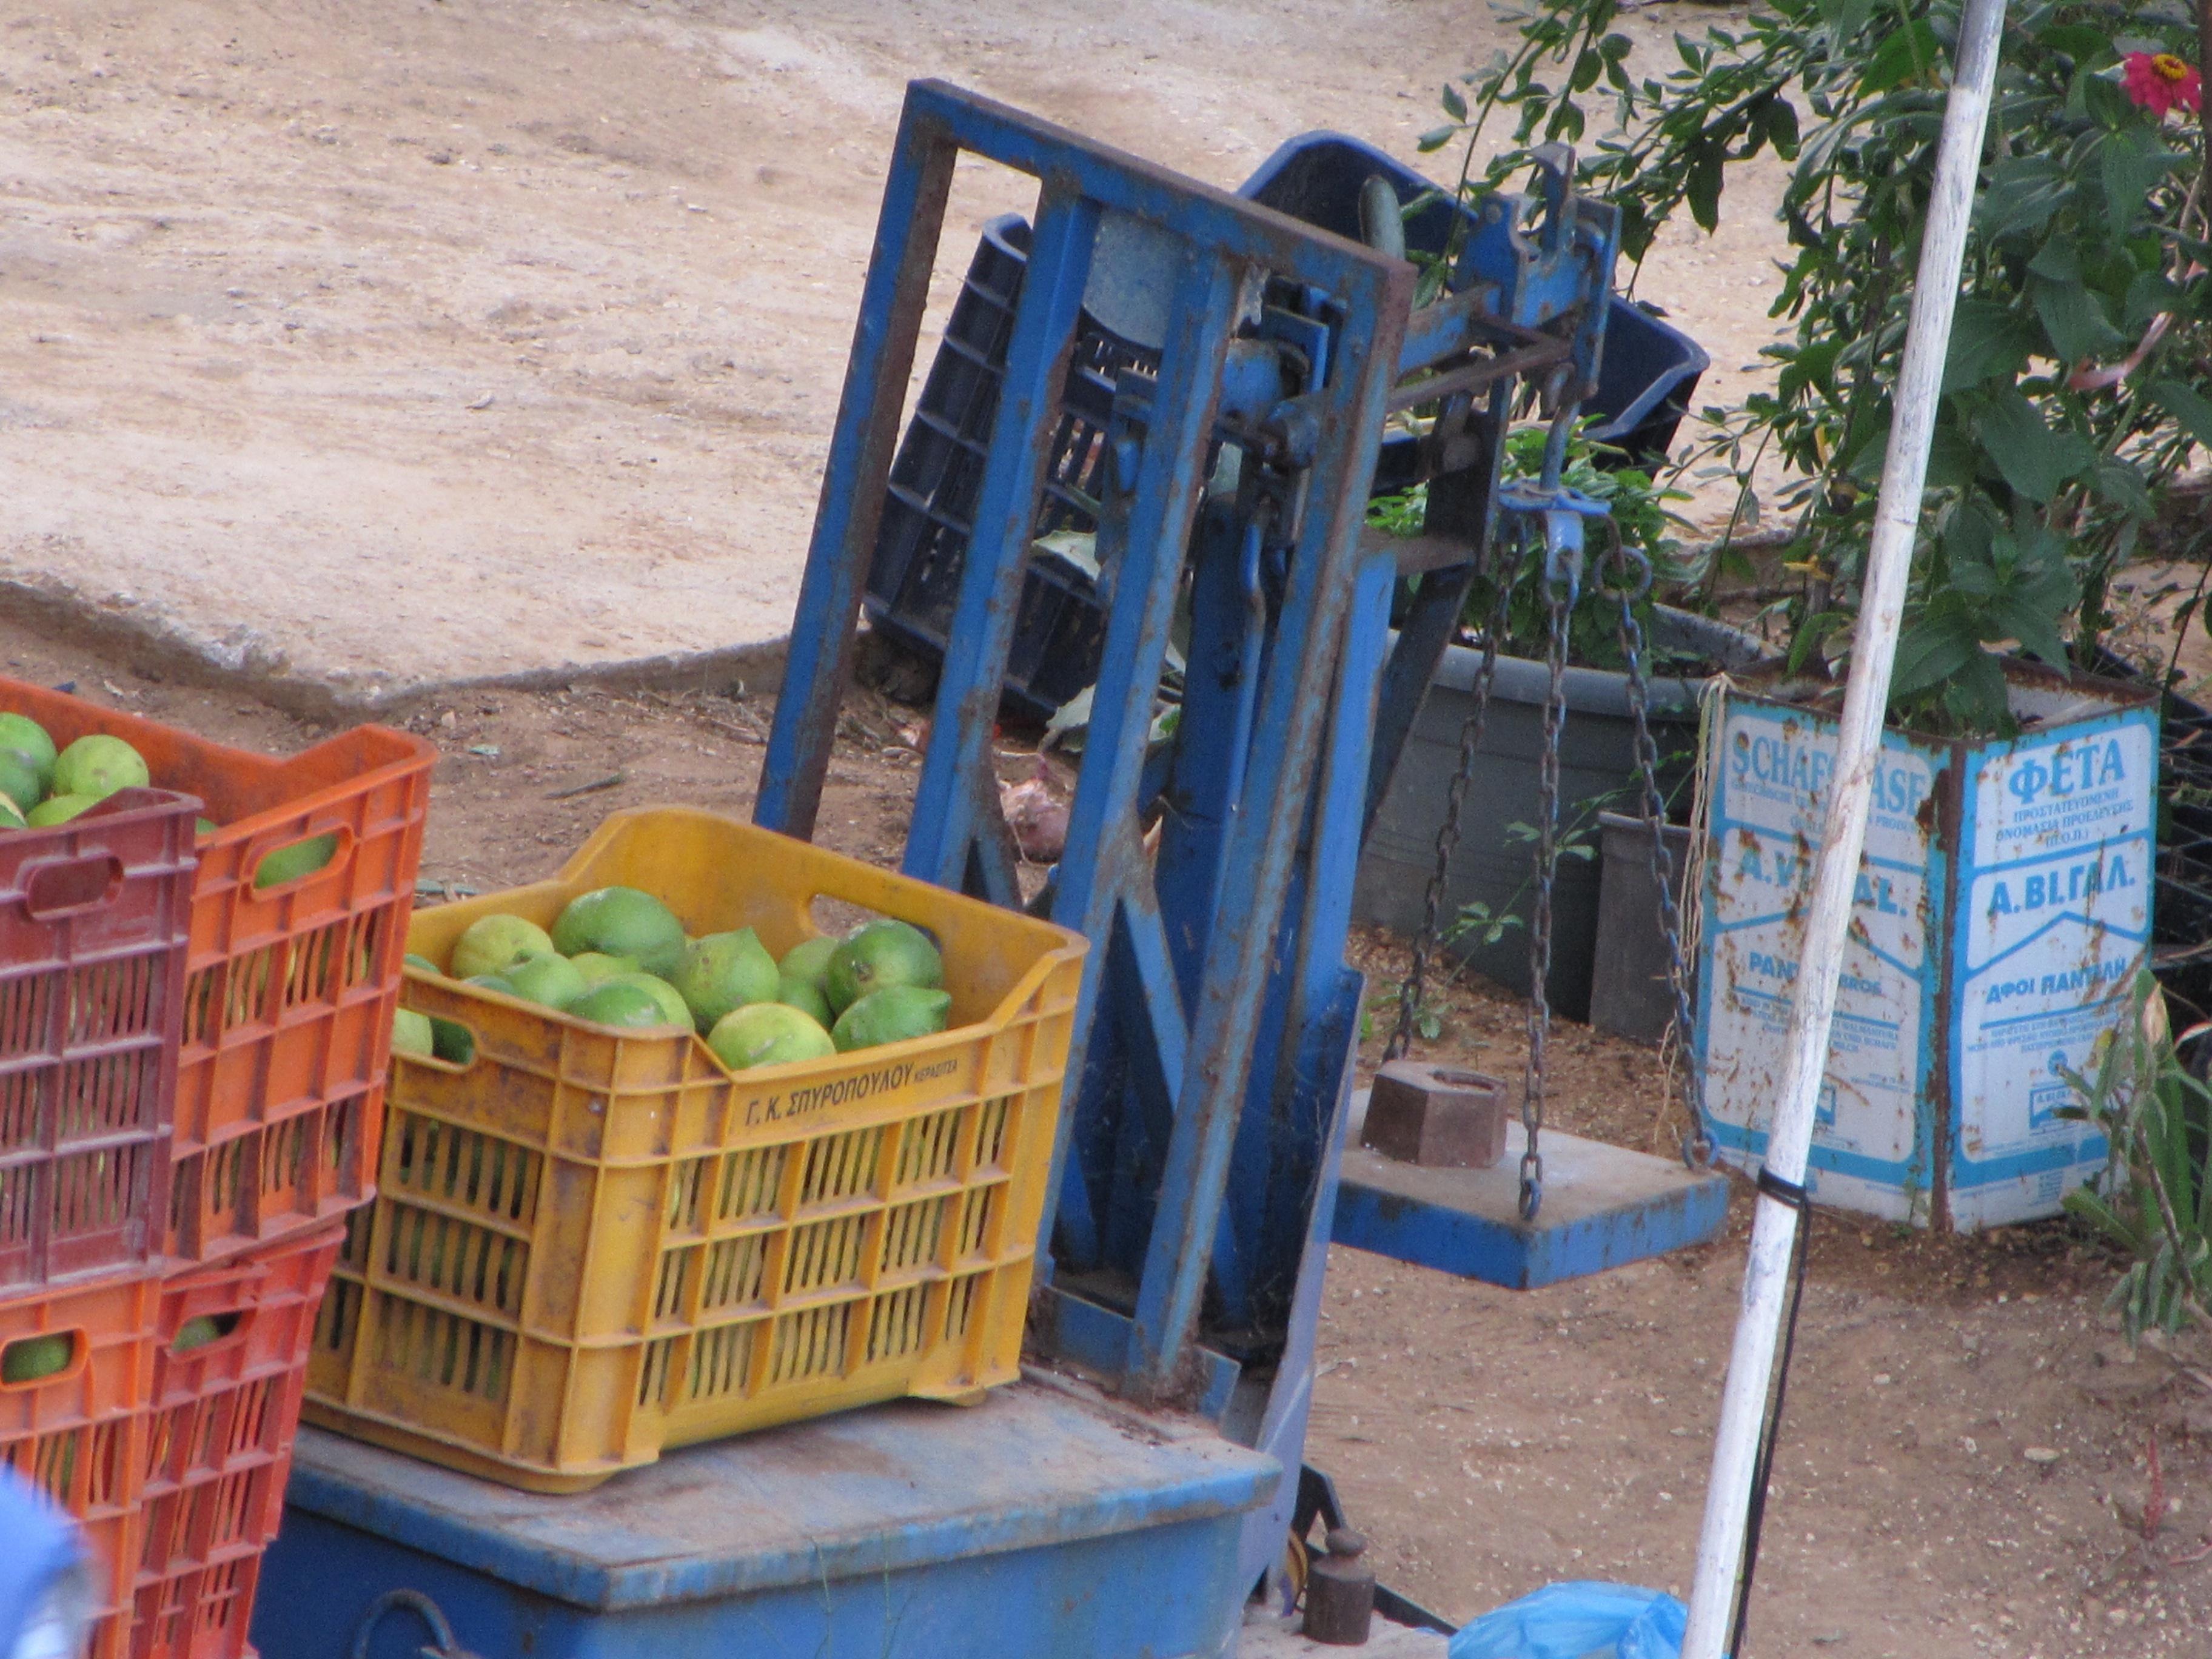 free images city backyard public space playground waste man